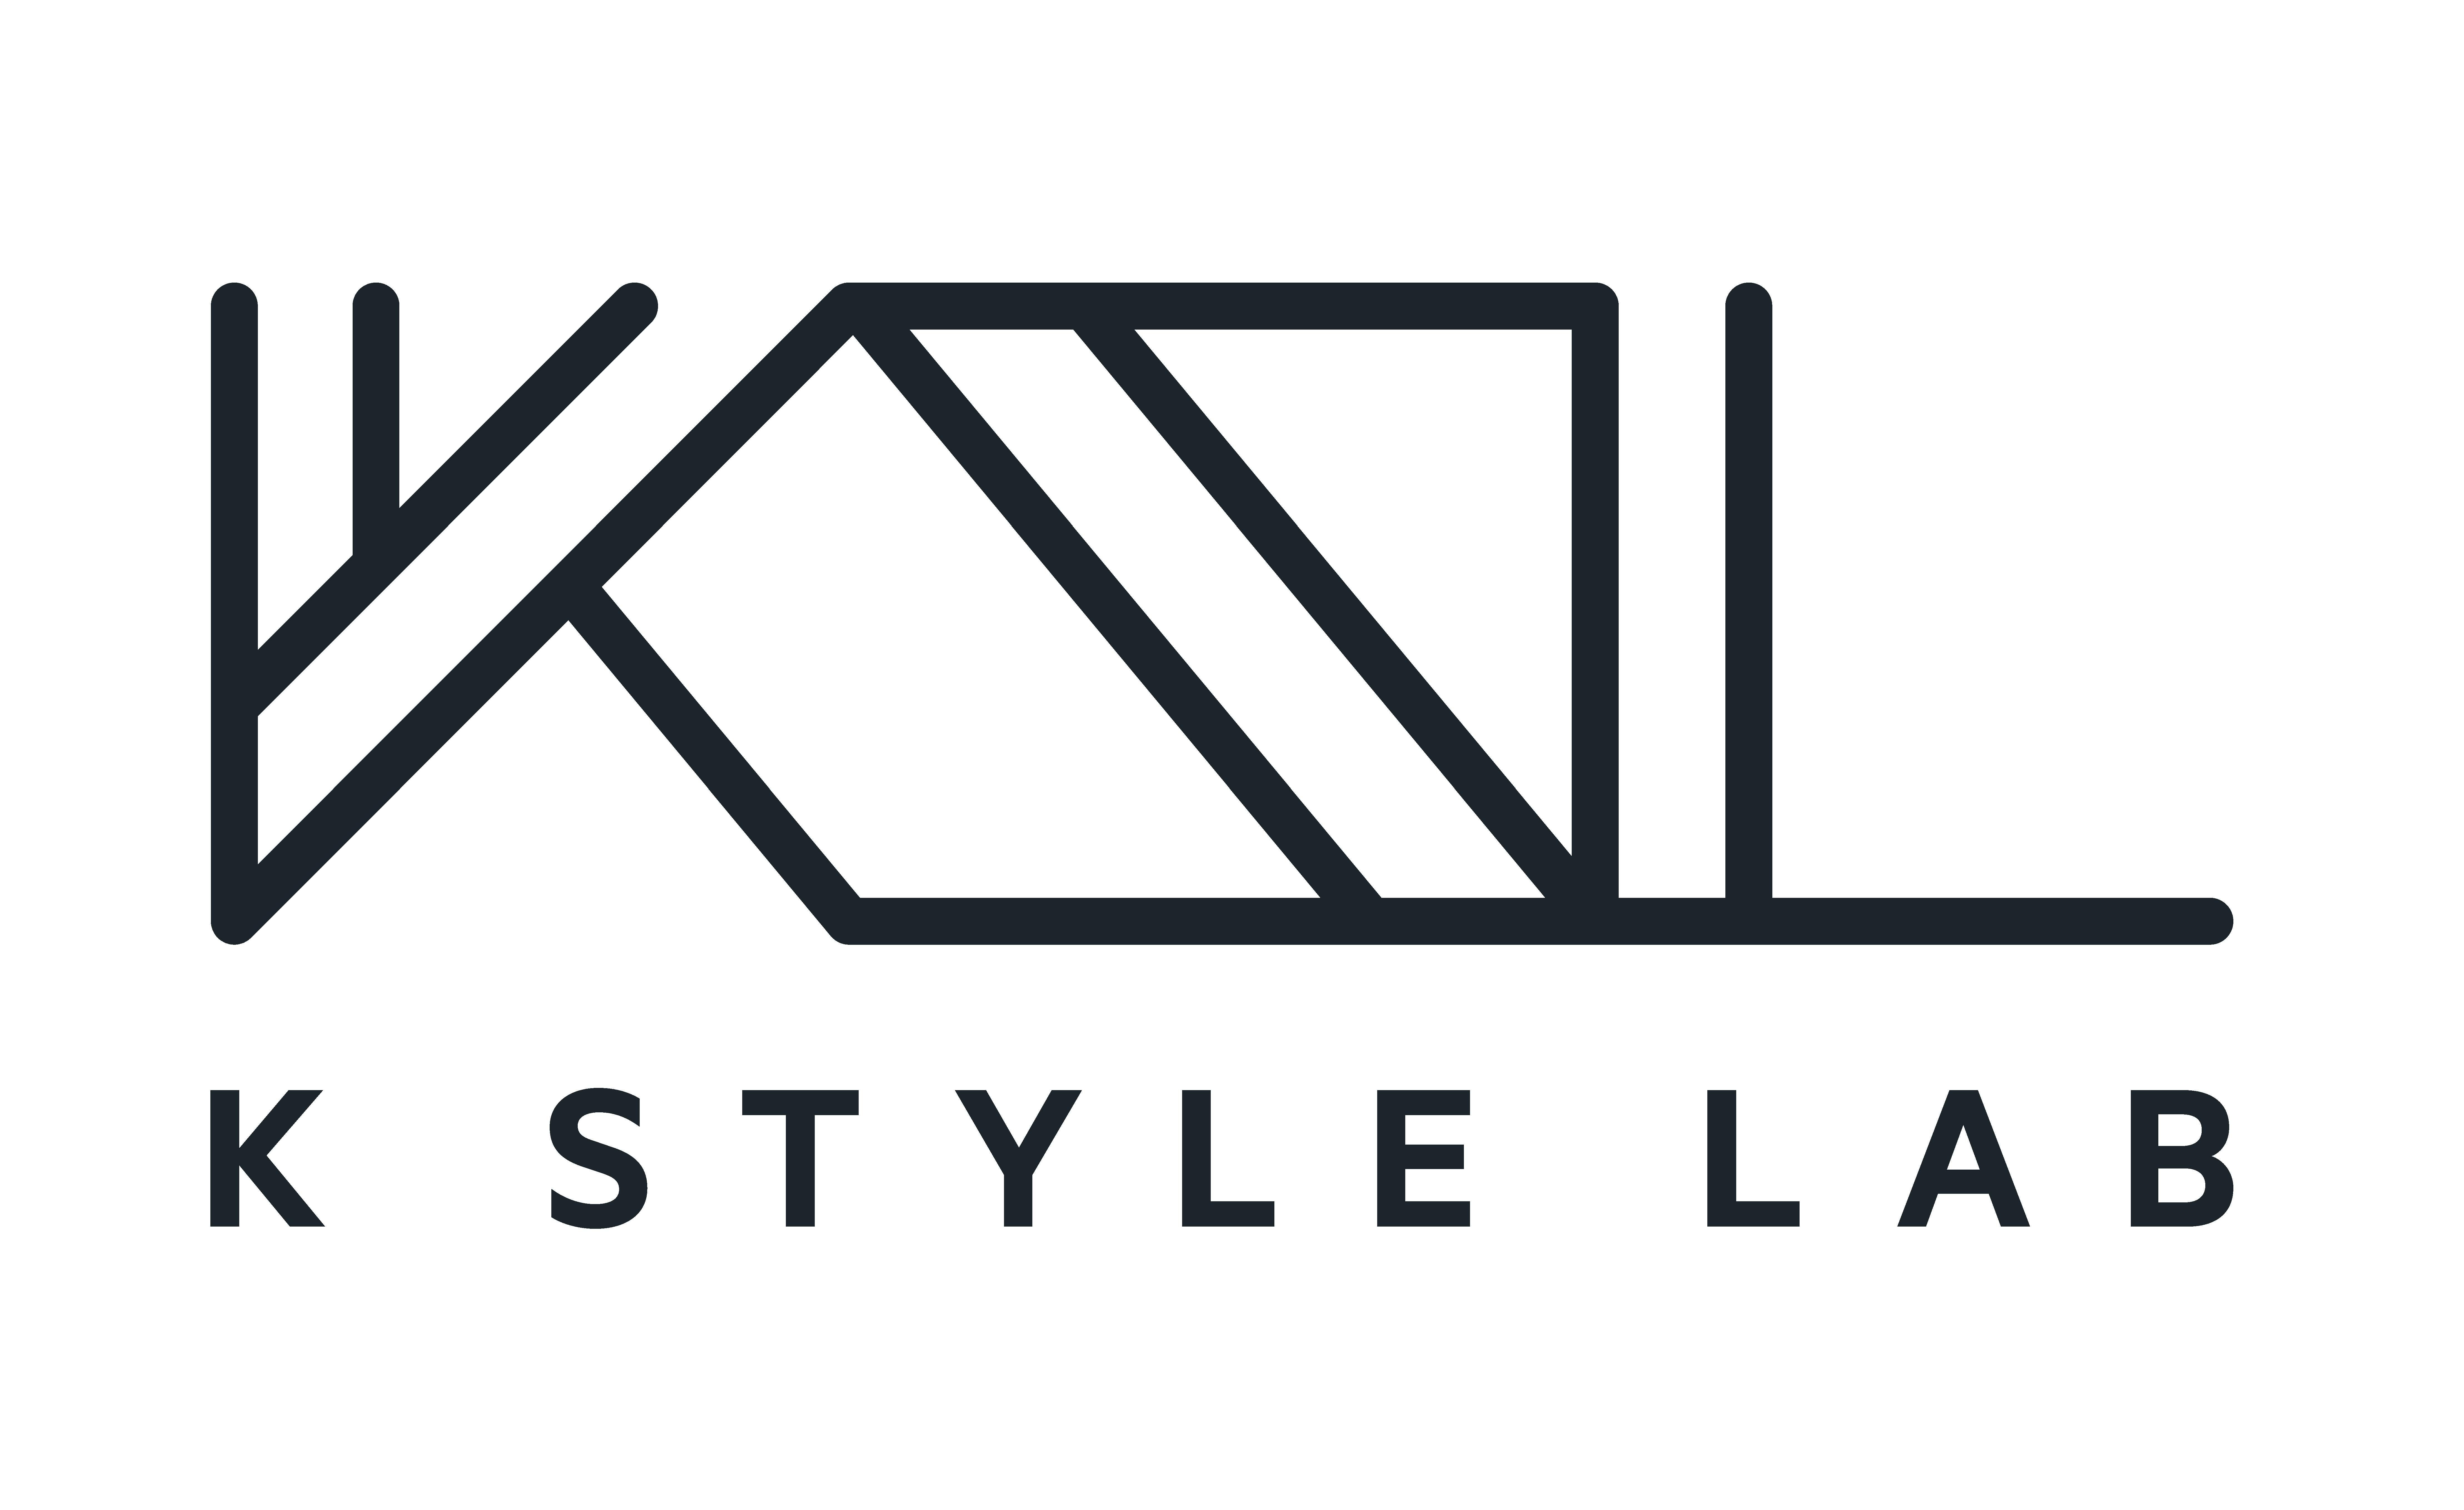 K style Lab